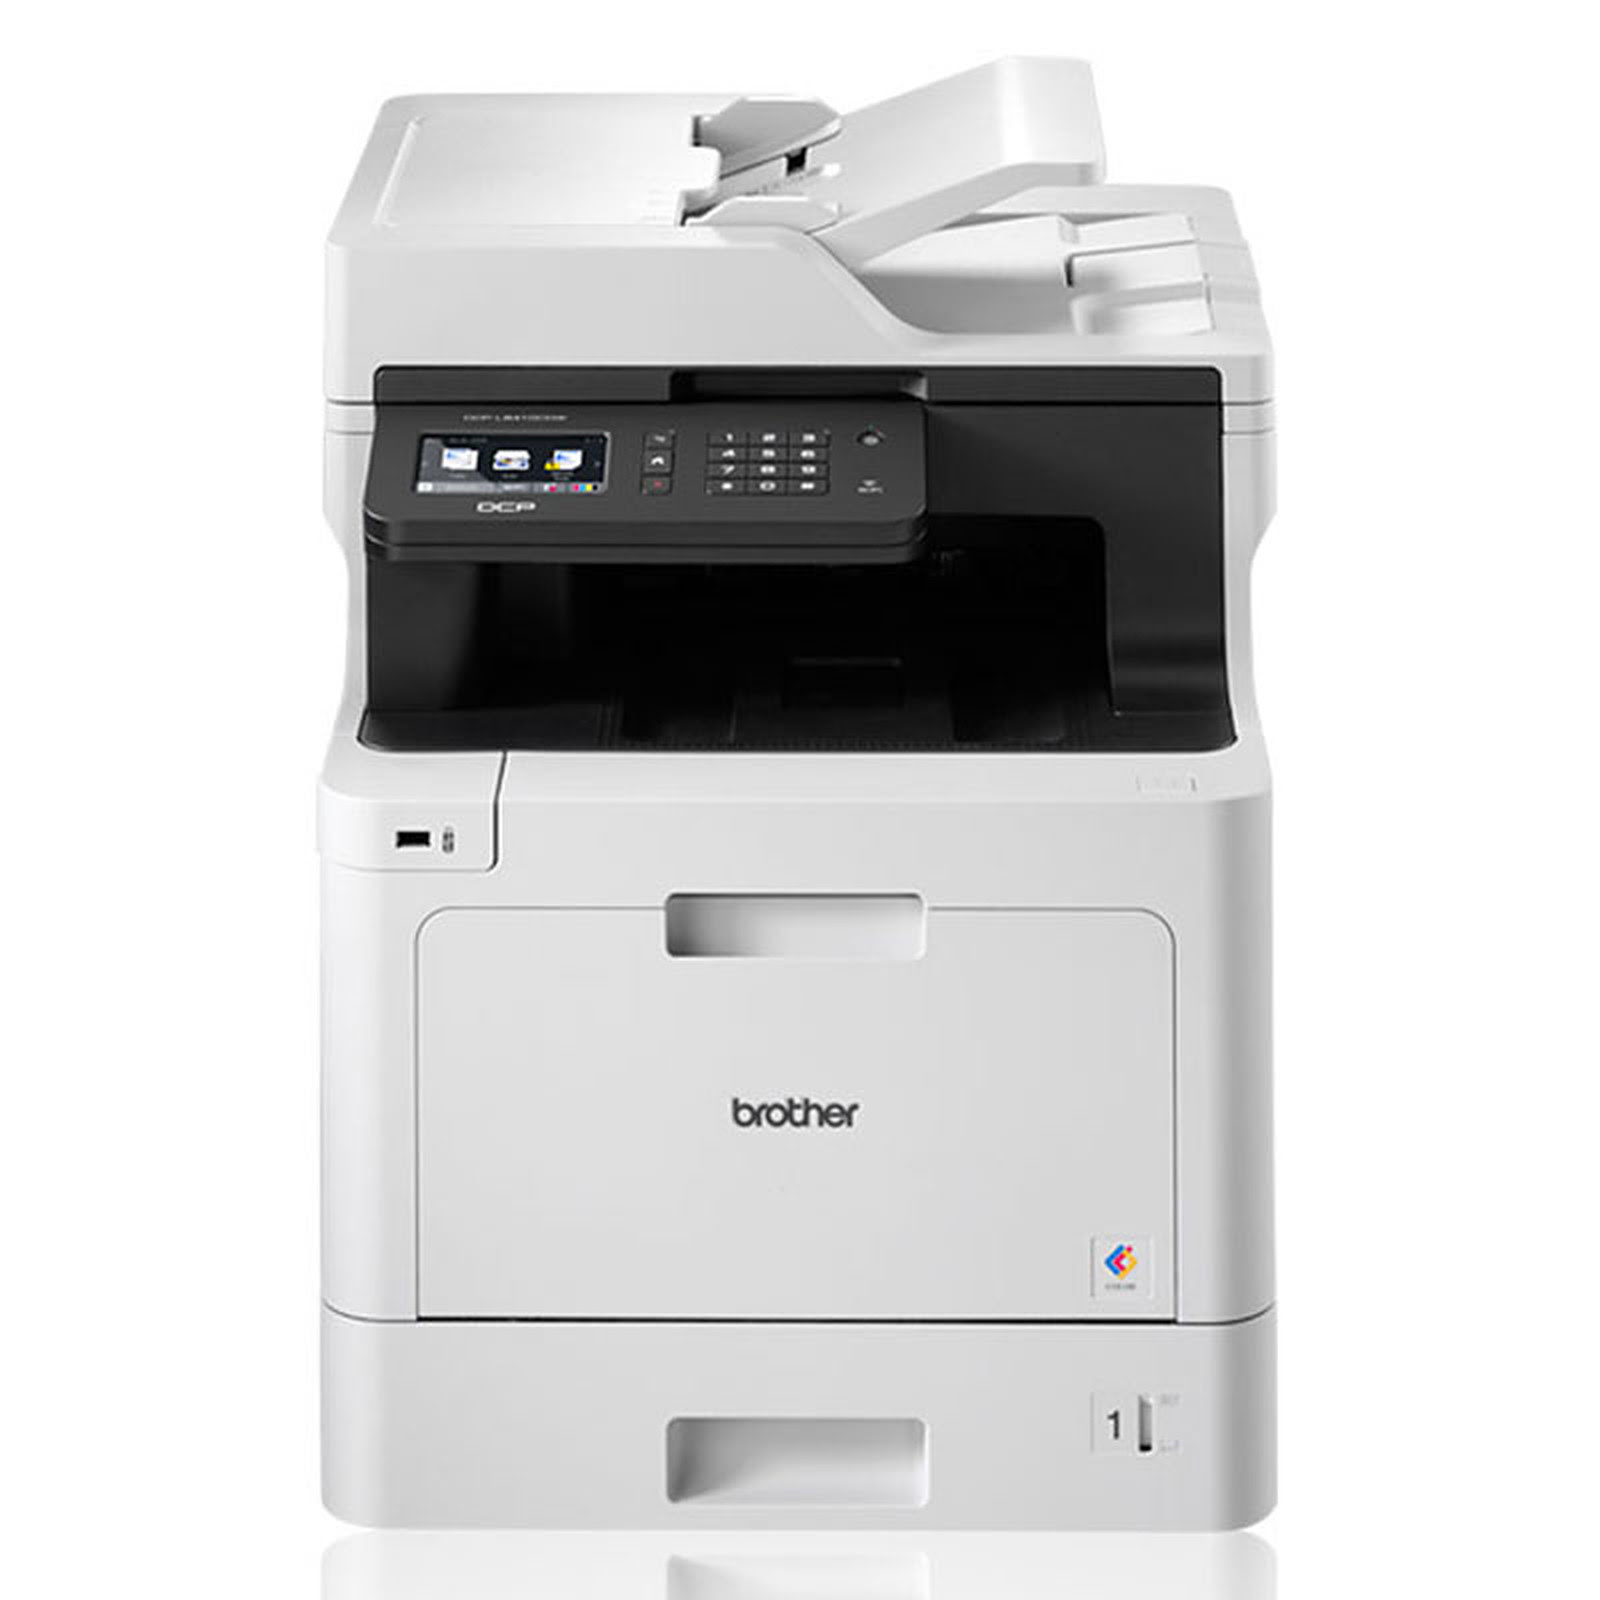 Imprimante multifonction Brother DCP-L8410CDW - Cybertek.fr - 0